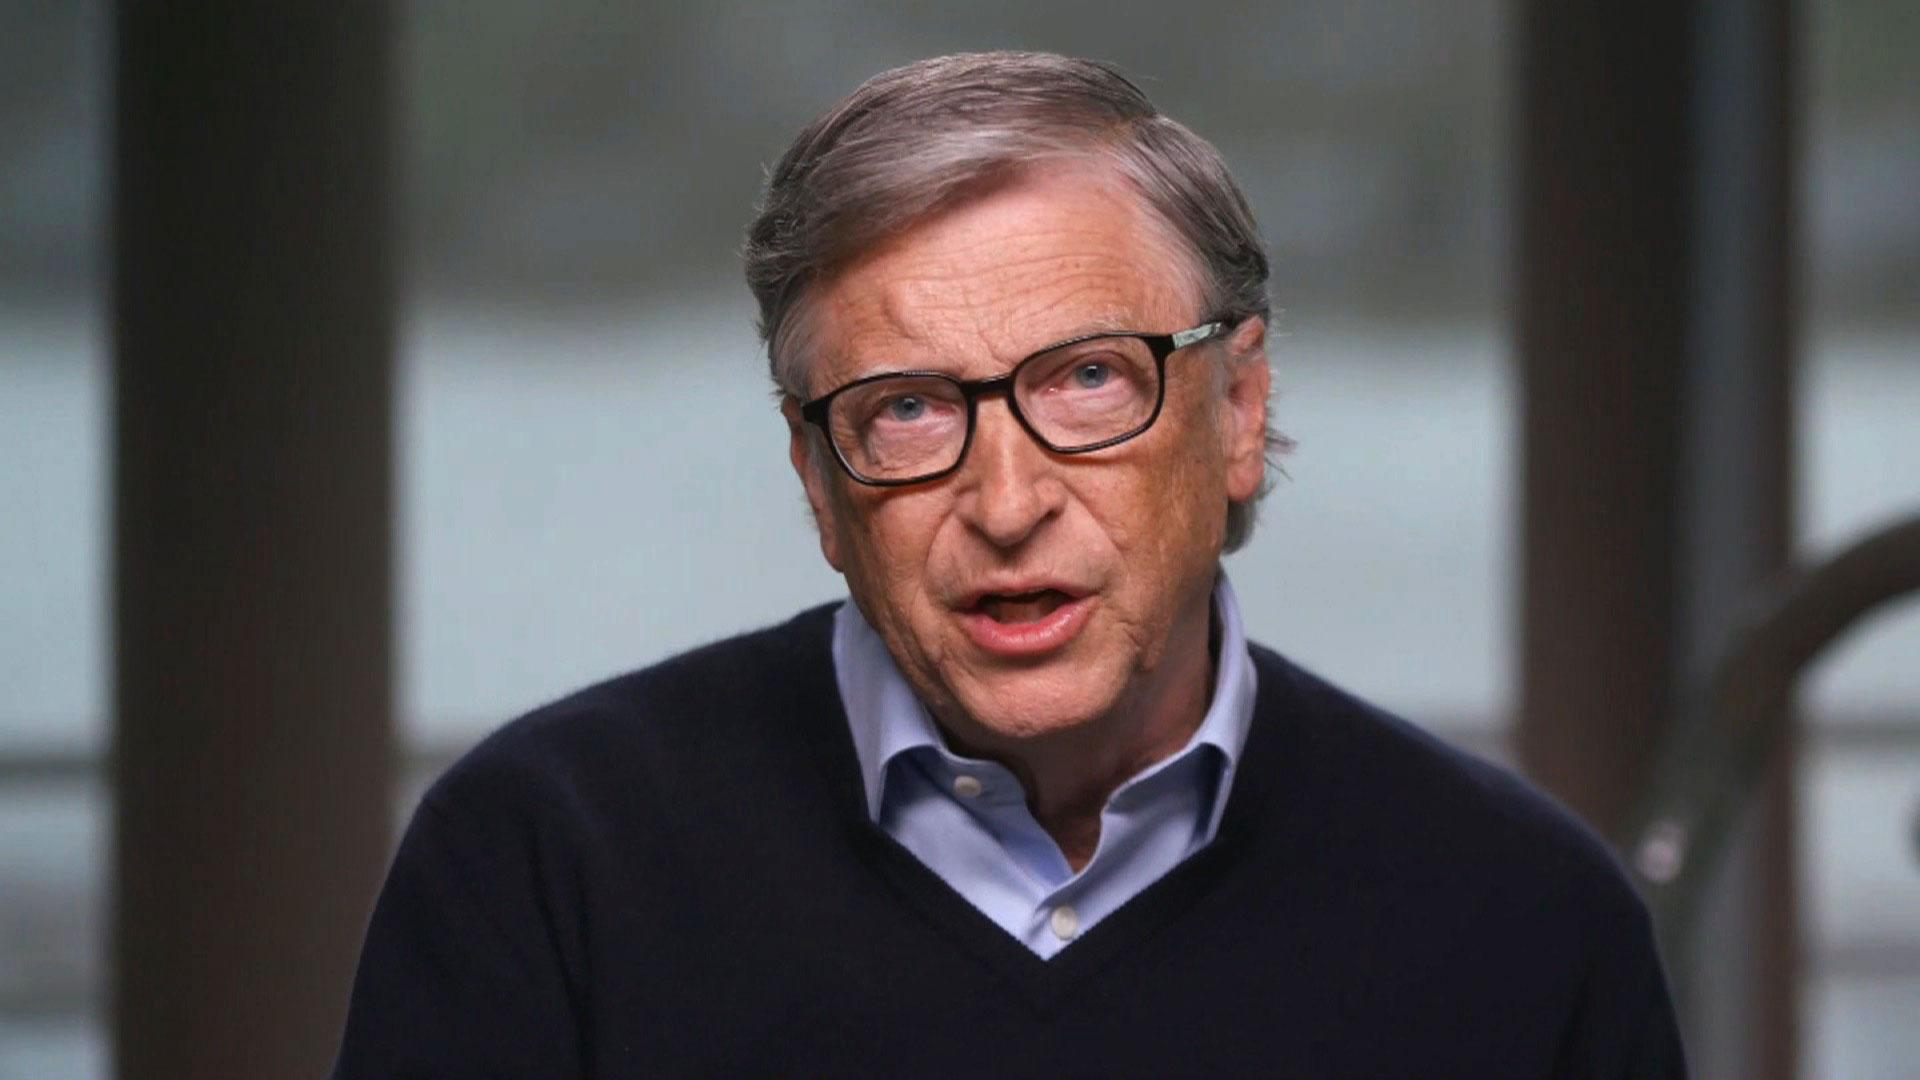 Microsoft co-founder and philanthropist Bill Gates.